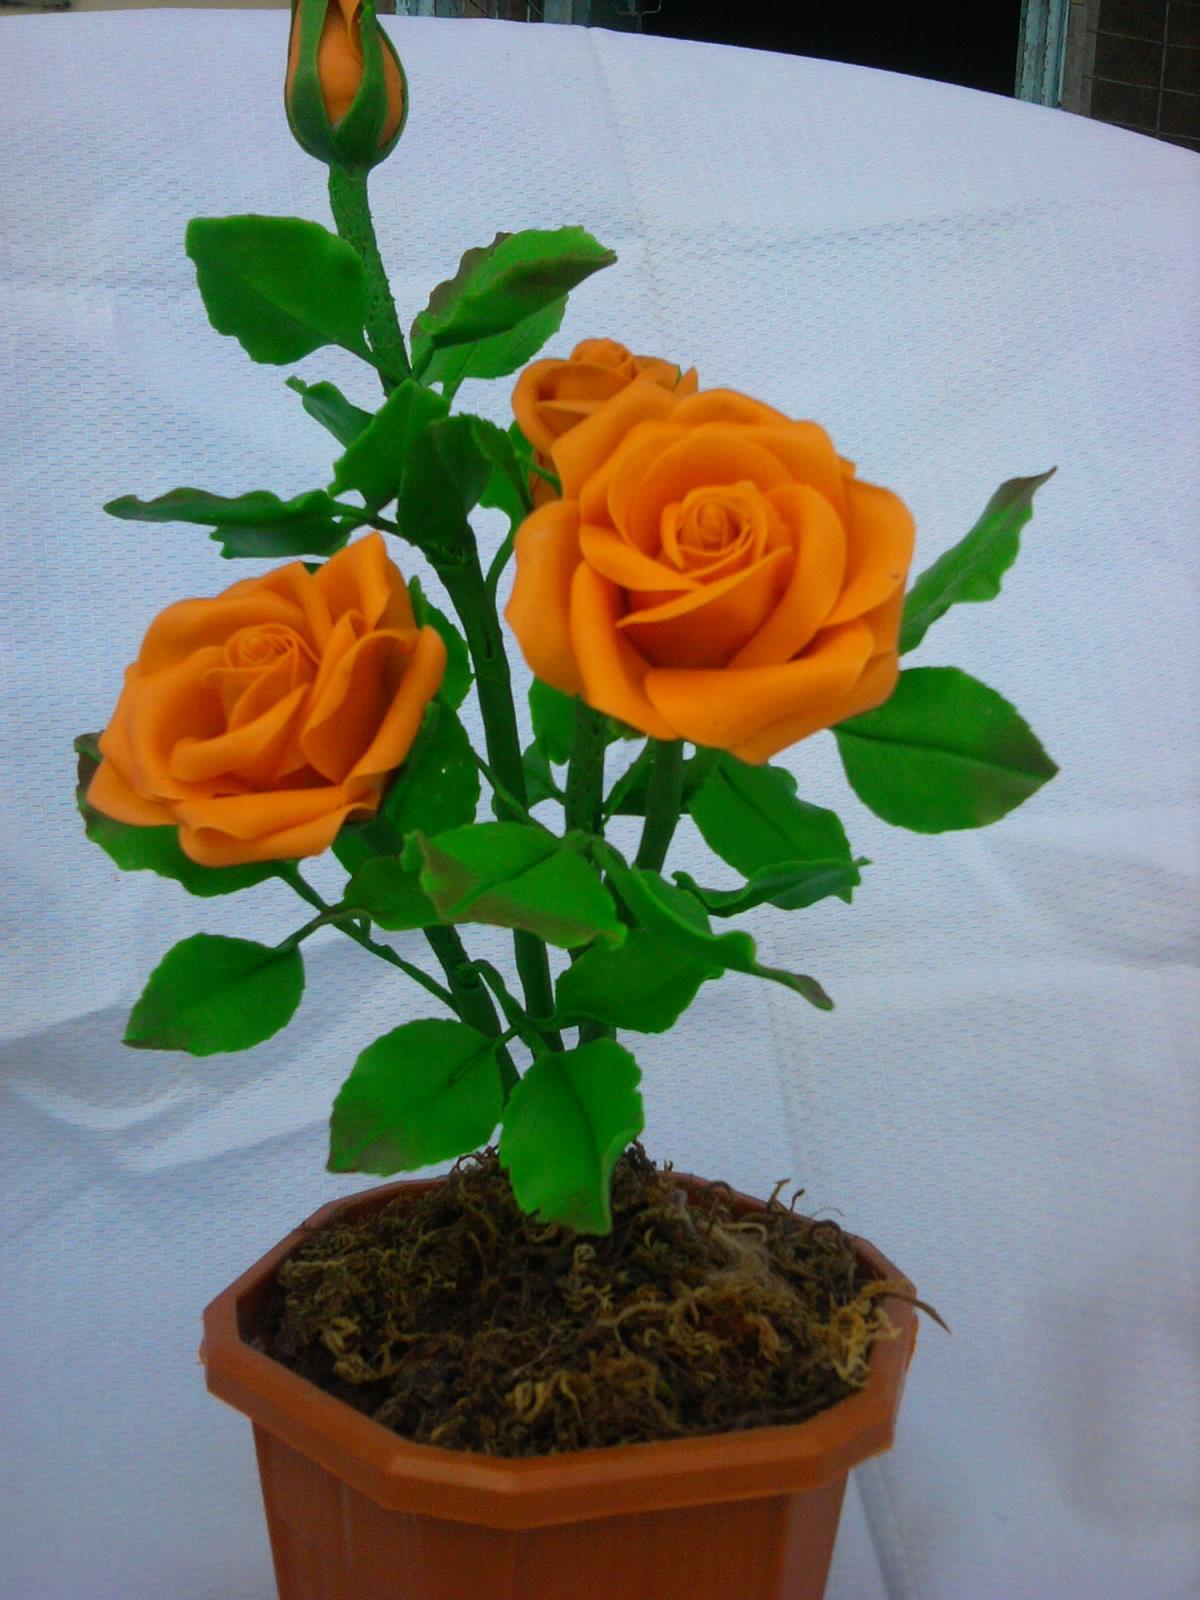 Handmade Blossoms: HAND MADE CLAY ROSE BLOSSOMS